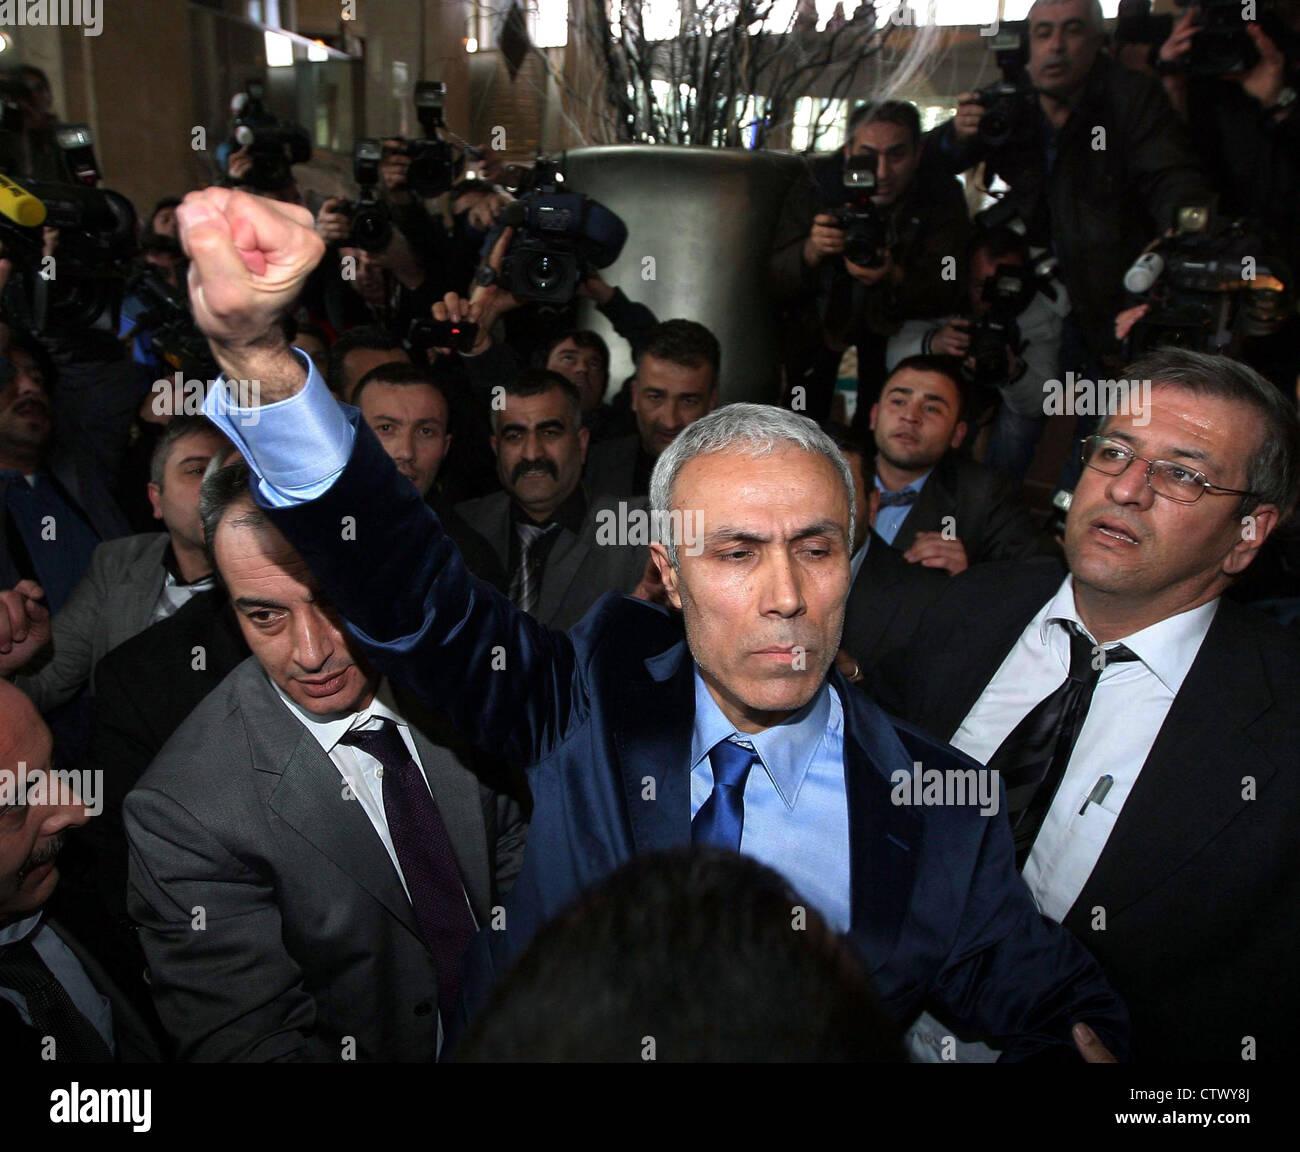 Mehmet Ali Ağca murderer of Abdi İpekçi released from prison in 2010 - Stock Image